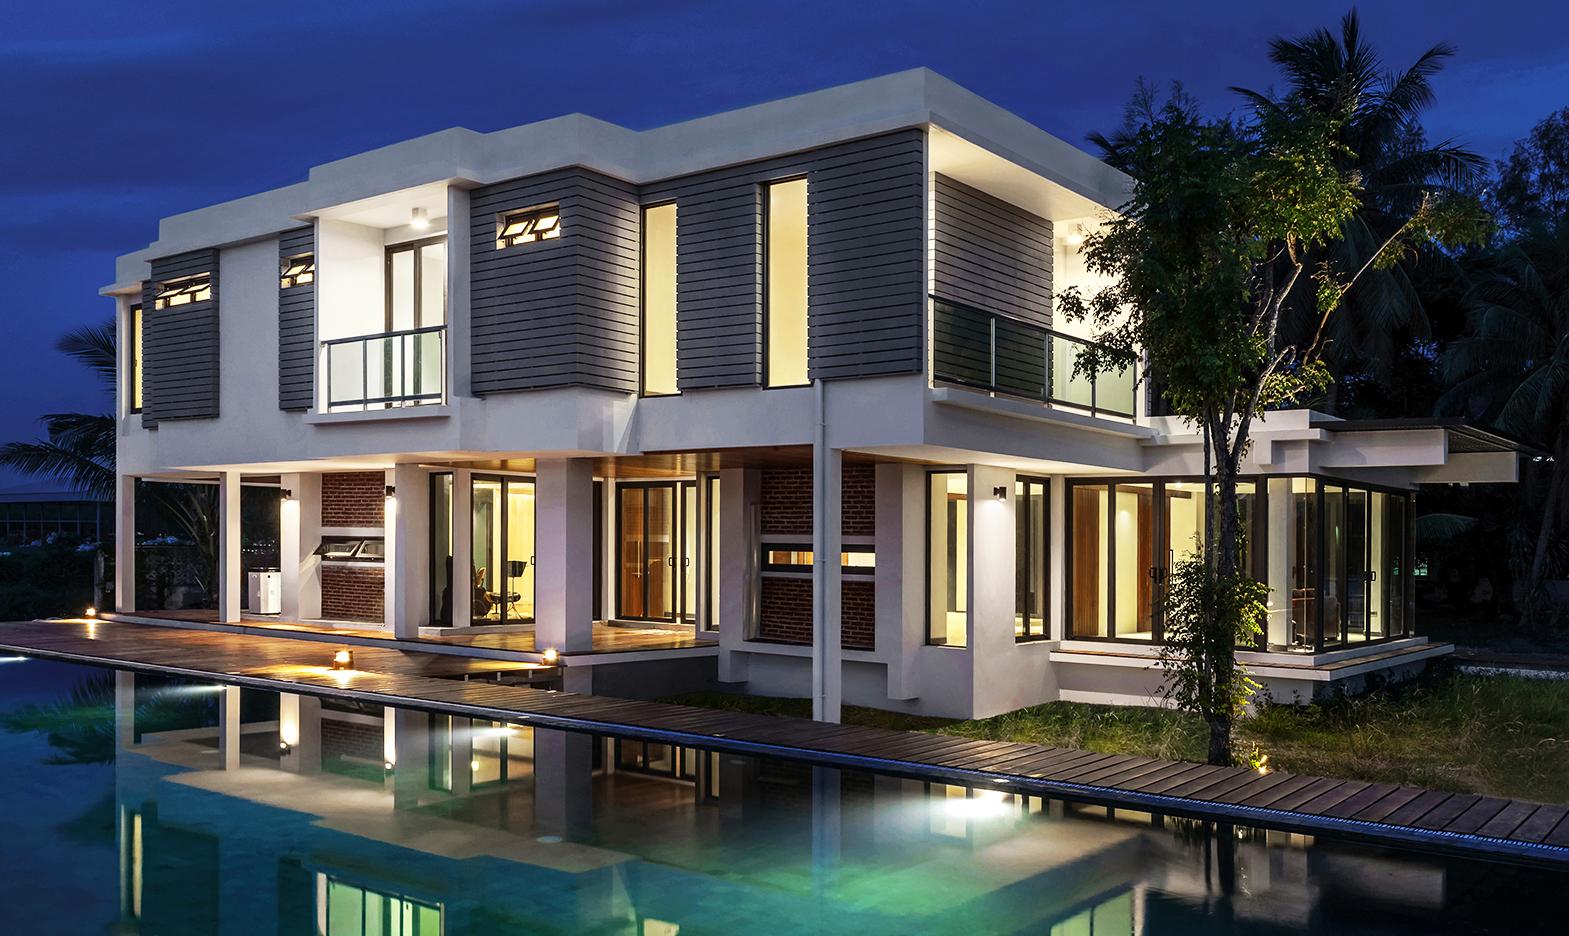 10design uthai residence house design modern architecture pattani thailand swimming pool 02